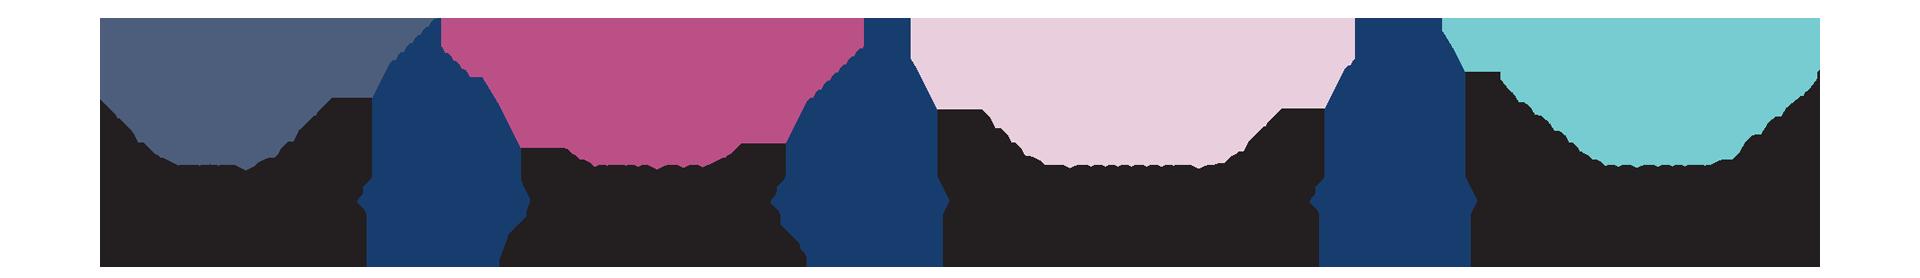 2019.09.12_Freezer,-Microwave,-Oven-Safe.png